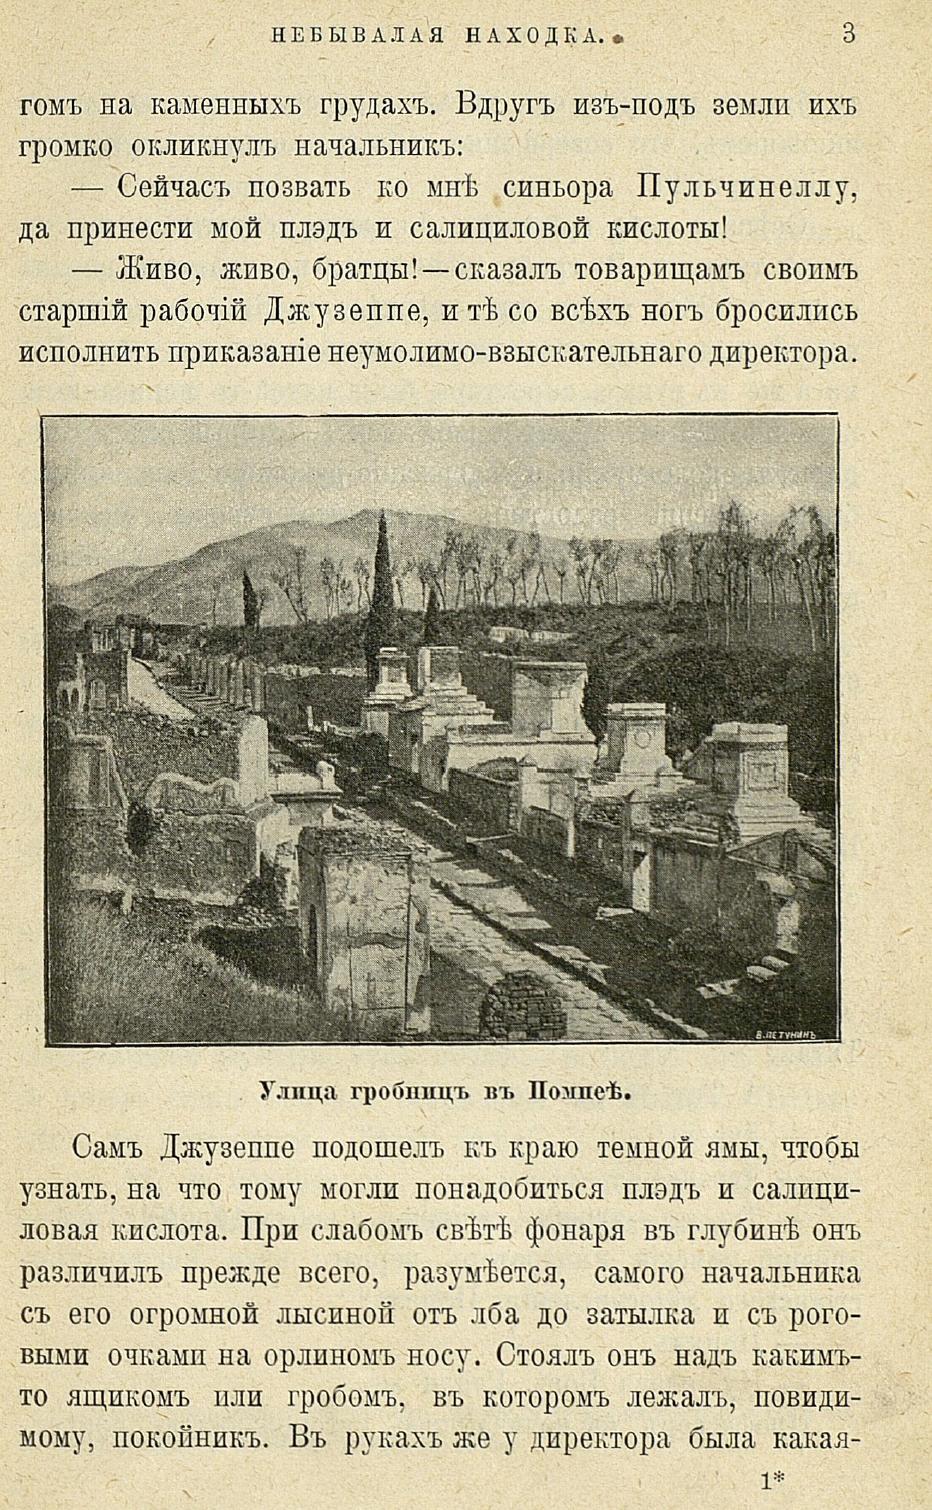 http://images.vfl.ru/ii/1407084884/5d1c37c8/5887470.jpg